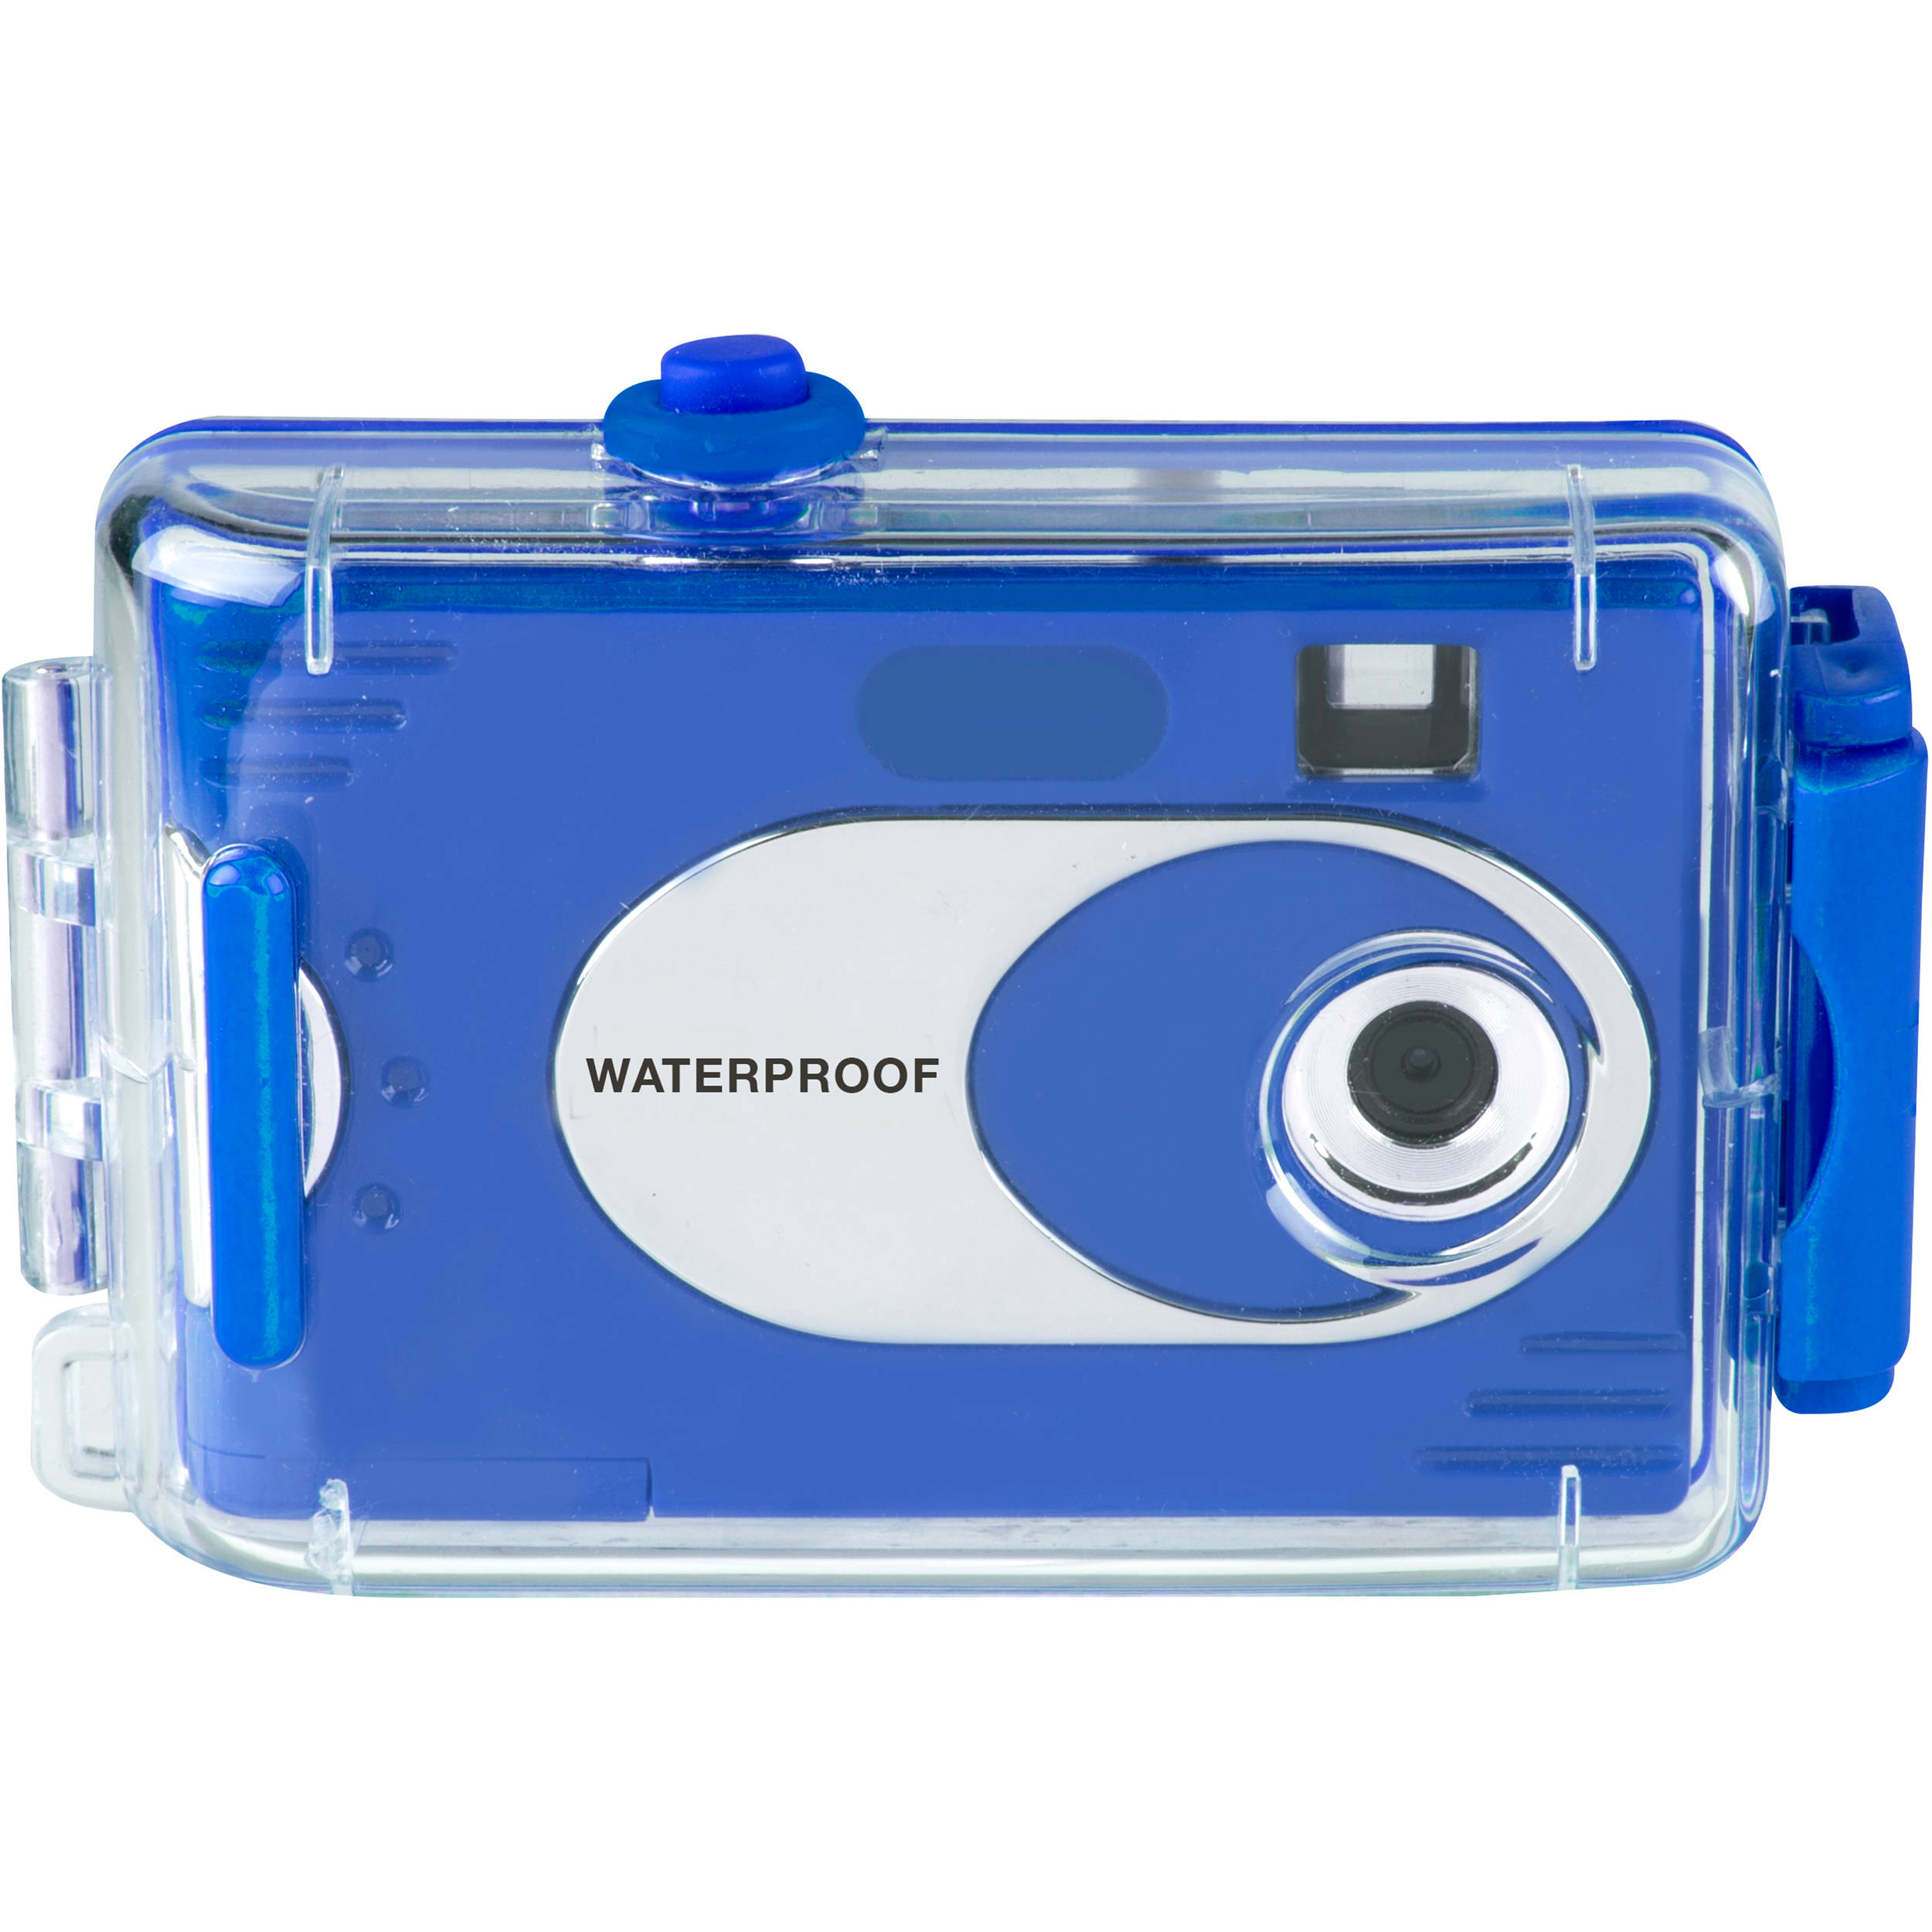 vivitar aquashot underwater digital camera 26690 blue km b h rh bhphotovideo com Vivitar Digital Binocular Camera Manual Vivitar Camcorder